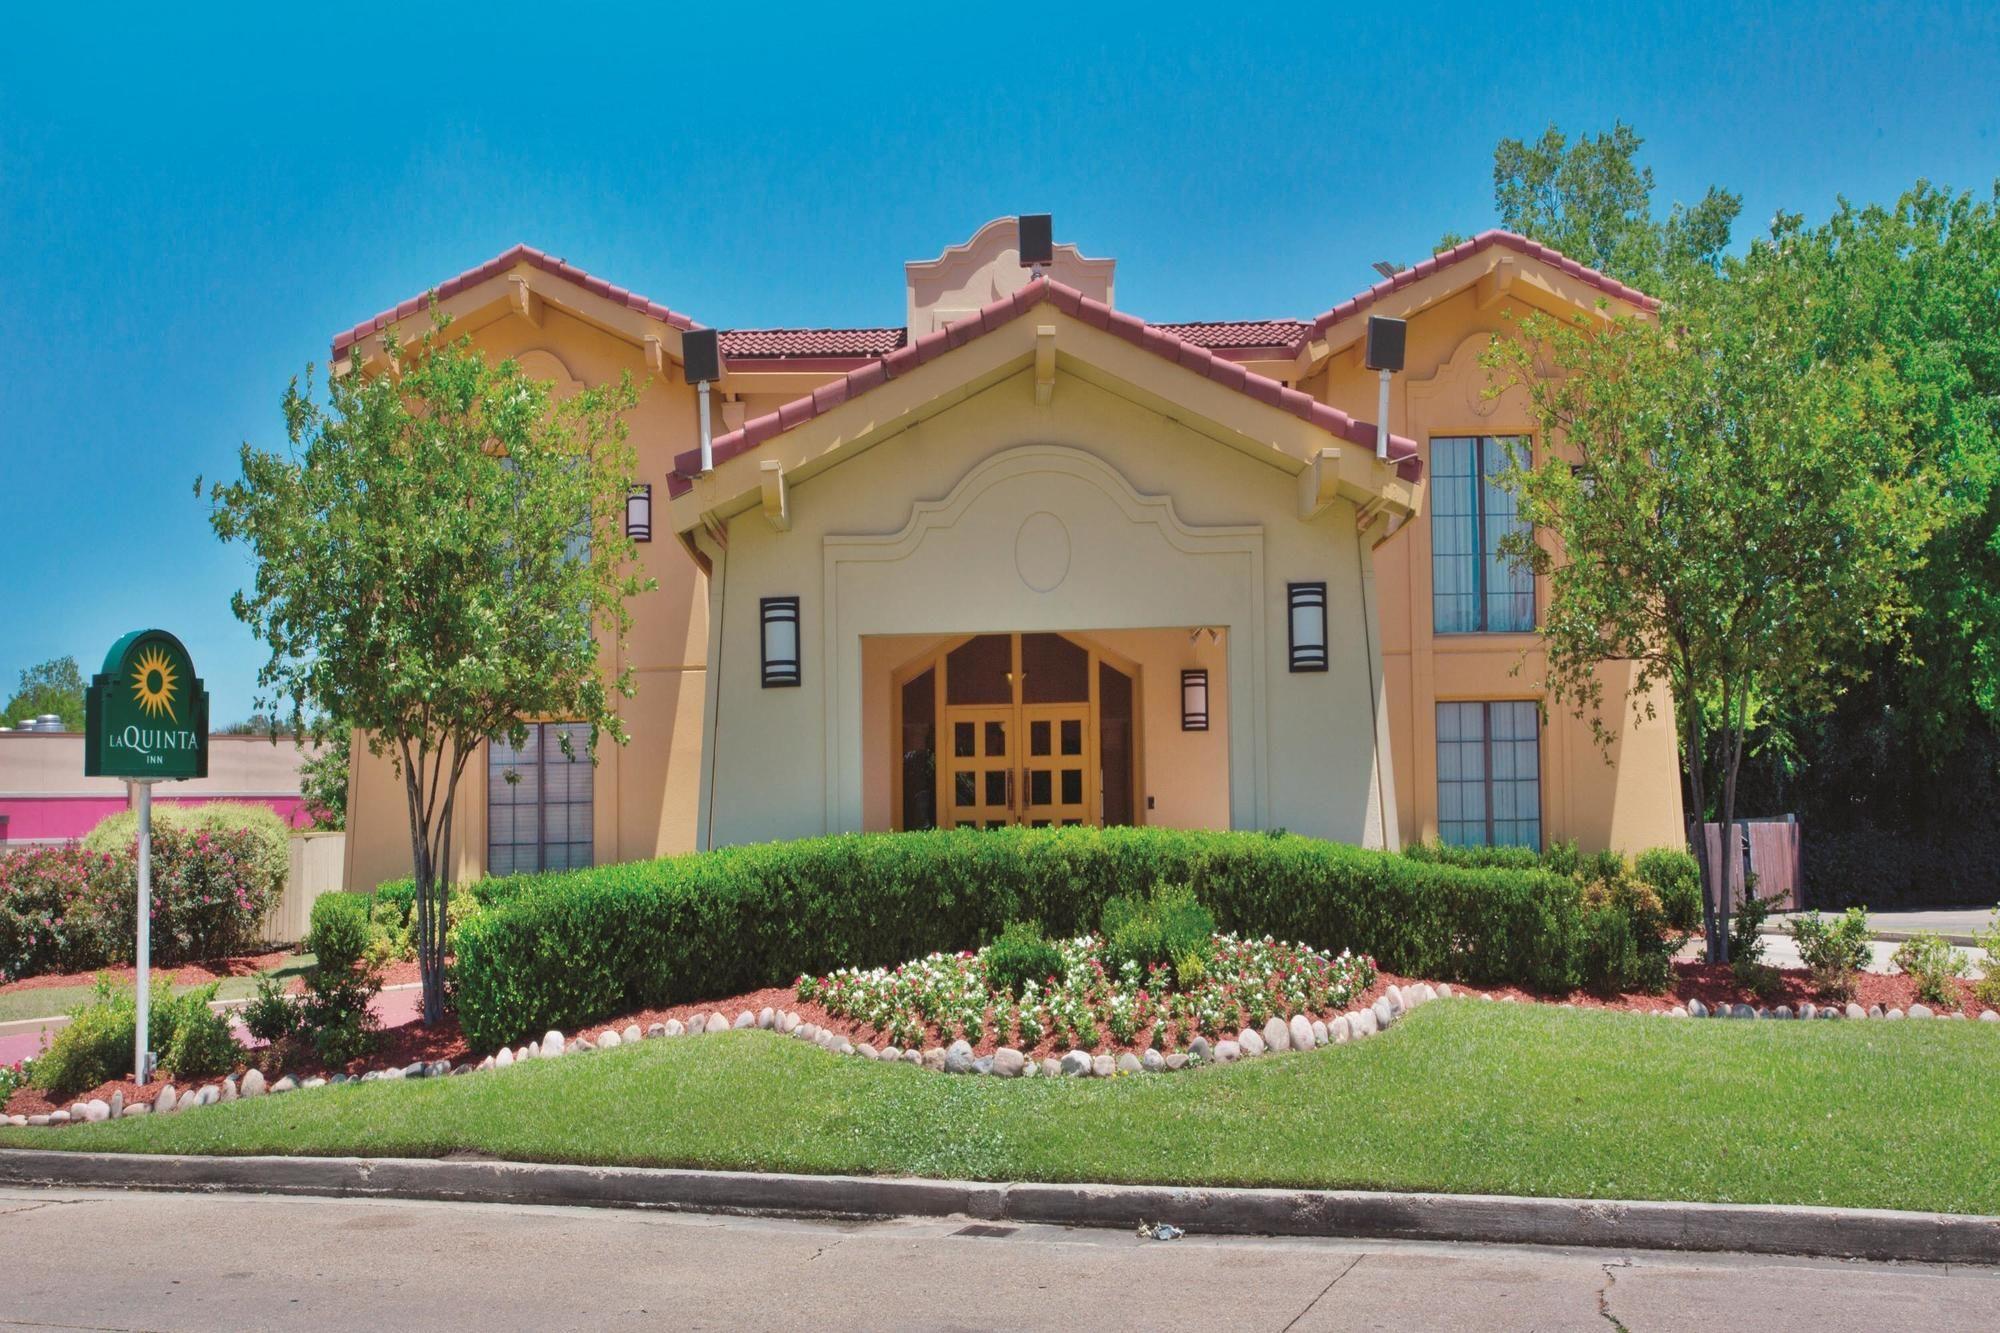 Baton Rouge Hotel Deals - Hotel Offers in Baton Rouge, LA